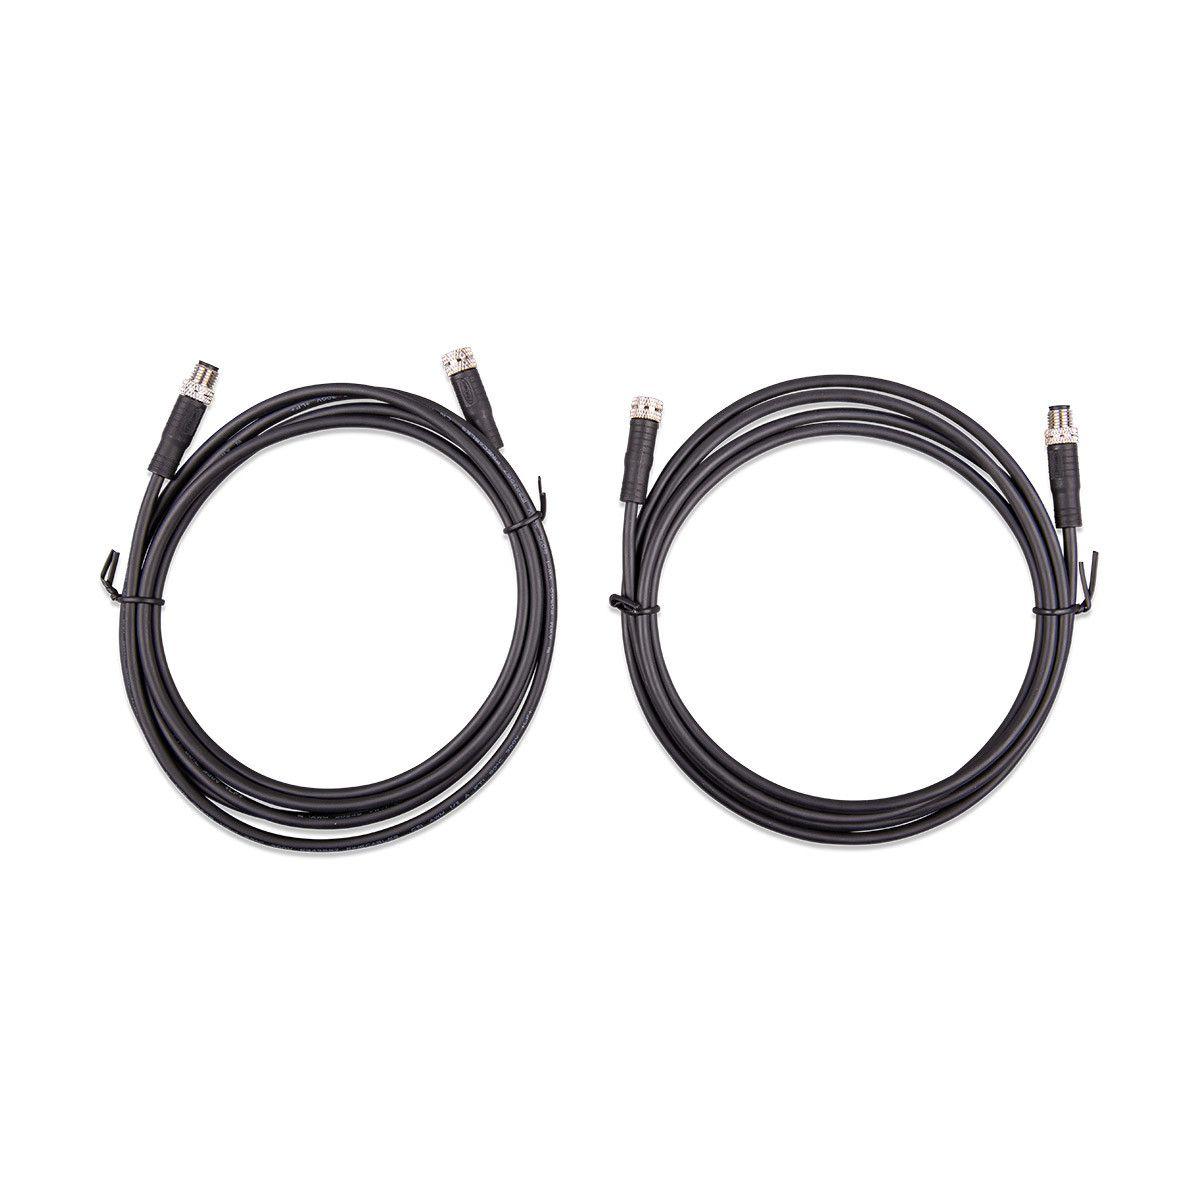 Cable 2m Avec M8 Circular Connector Male Female 3 Pole